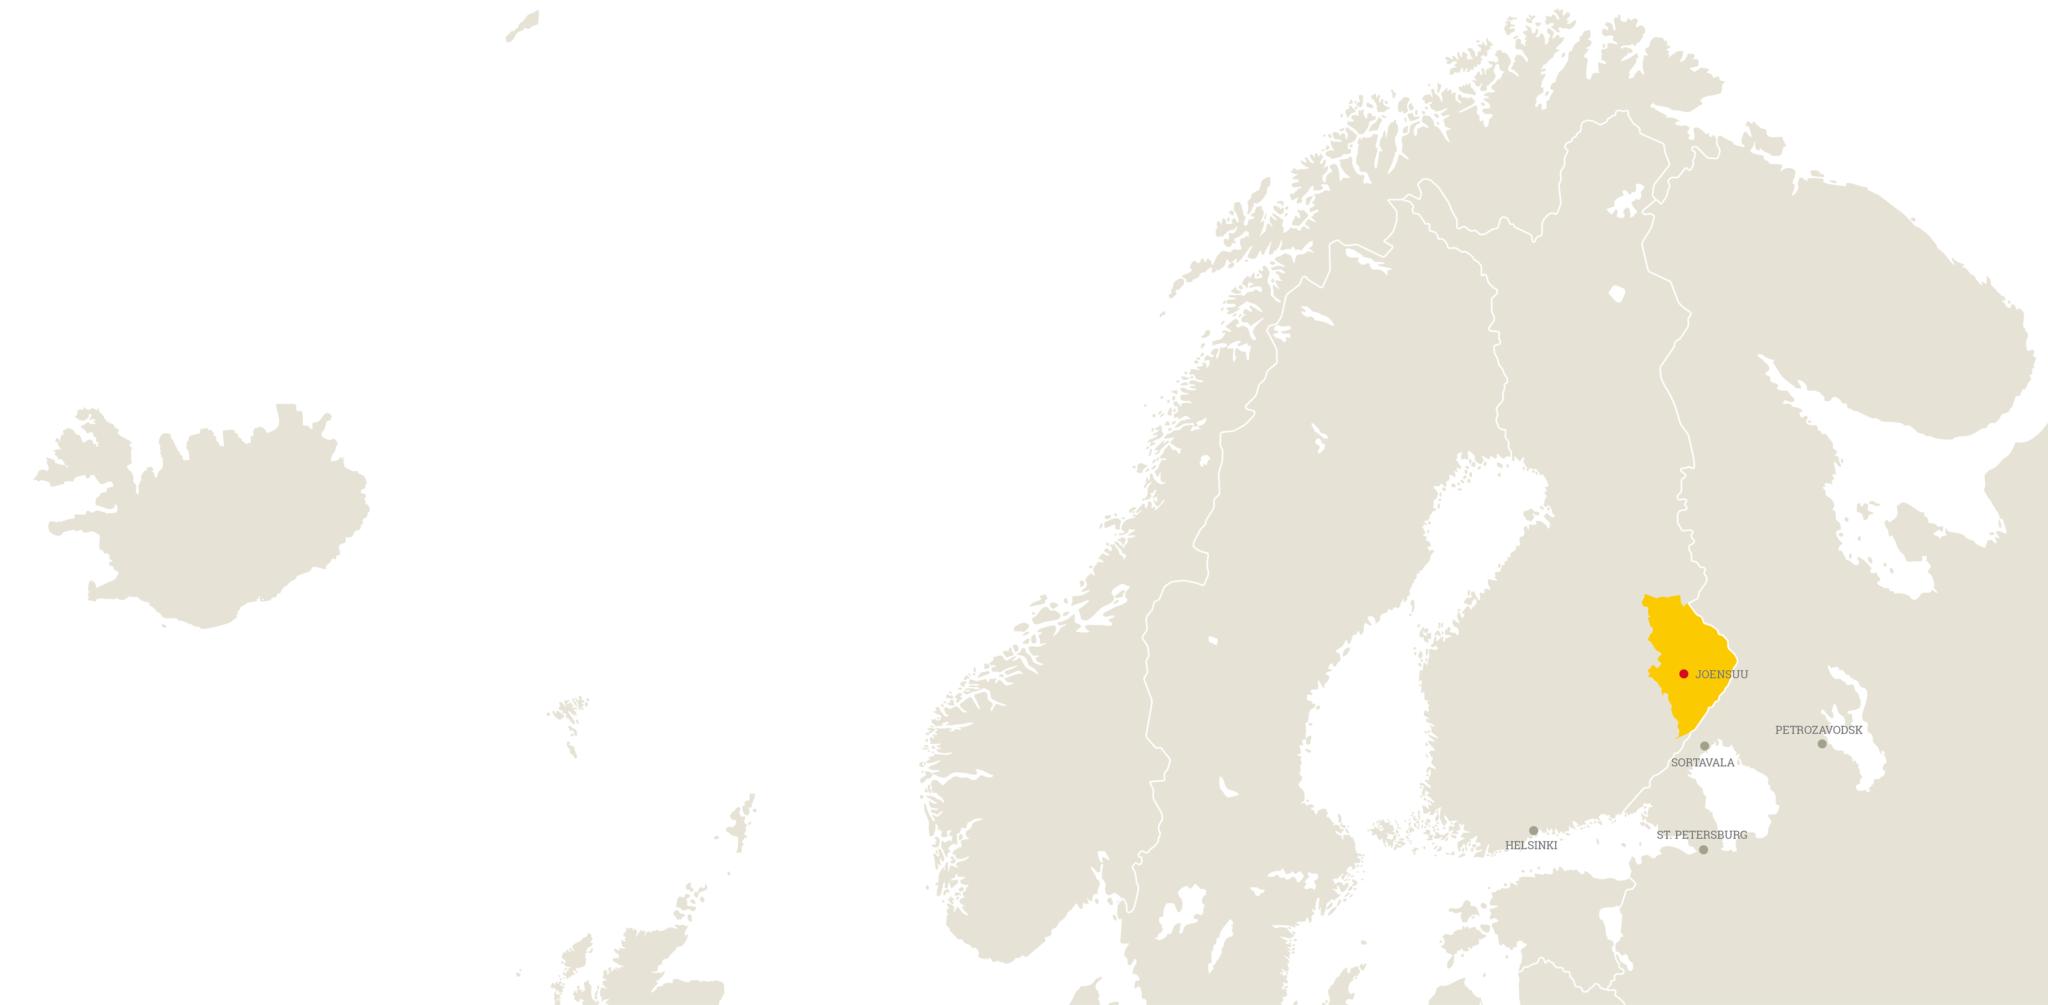 Lietsu Boutique Aparthotel Joensuu Finland sijainti keskusta kartta